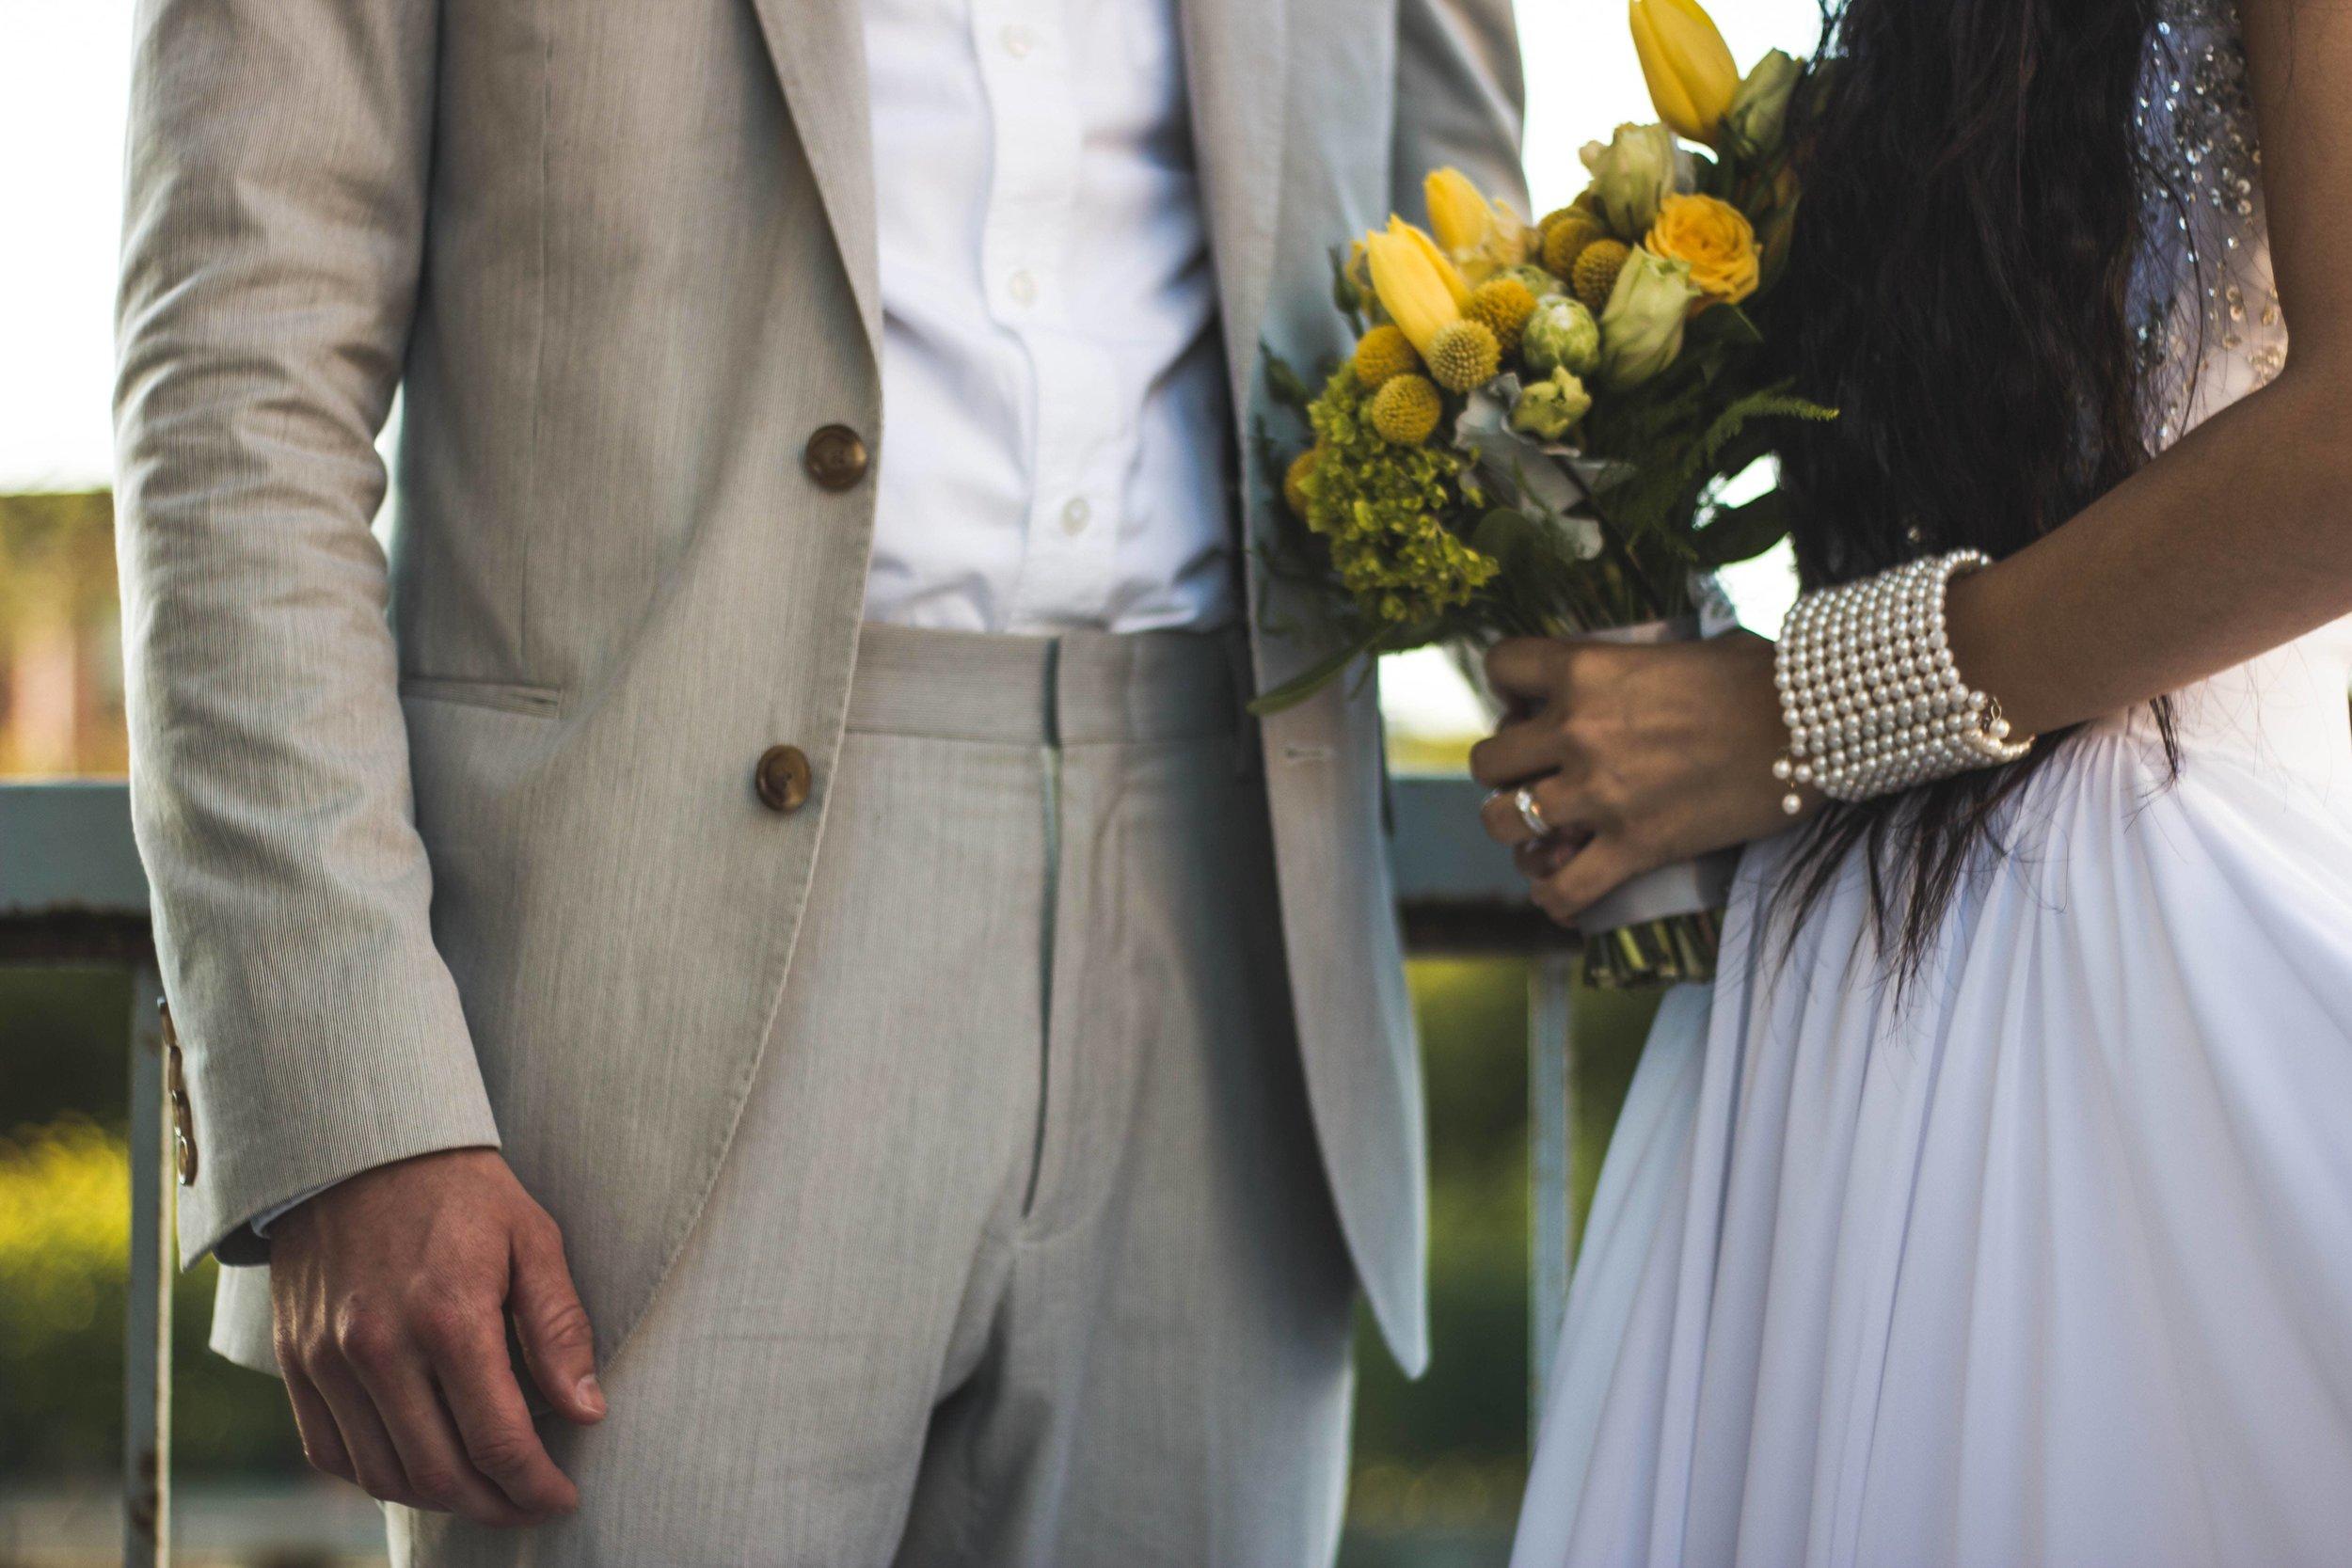 Wedding Attire for Bride and Groom